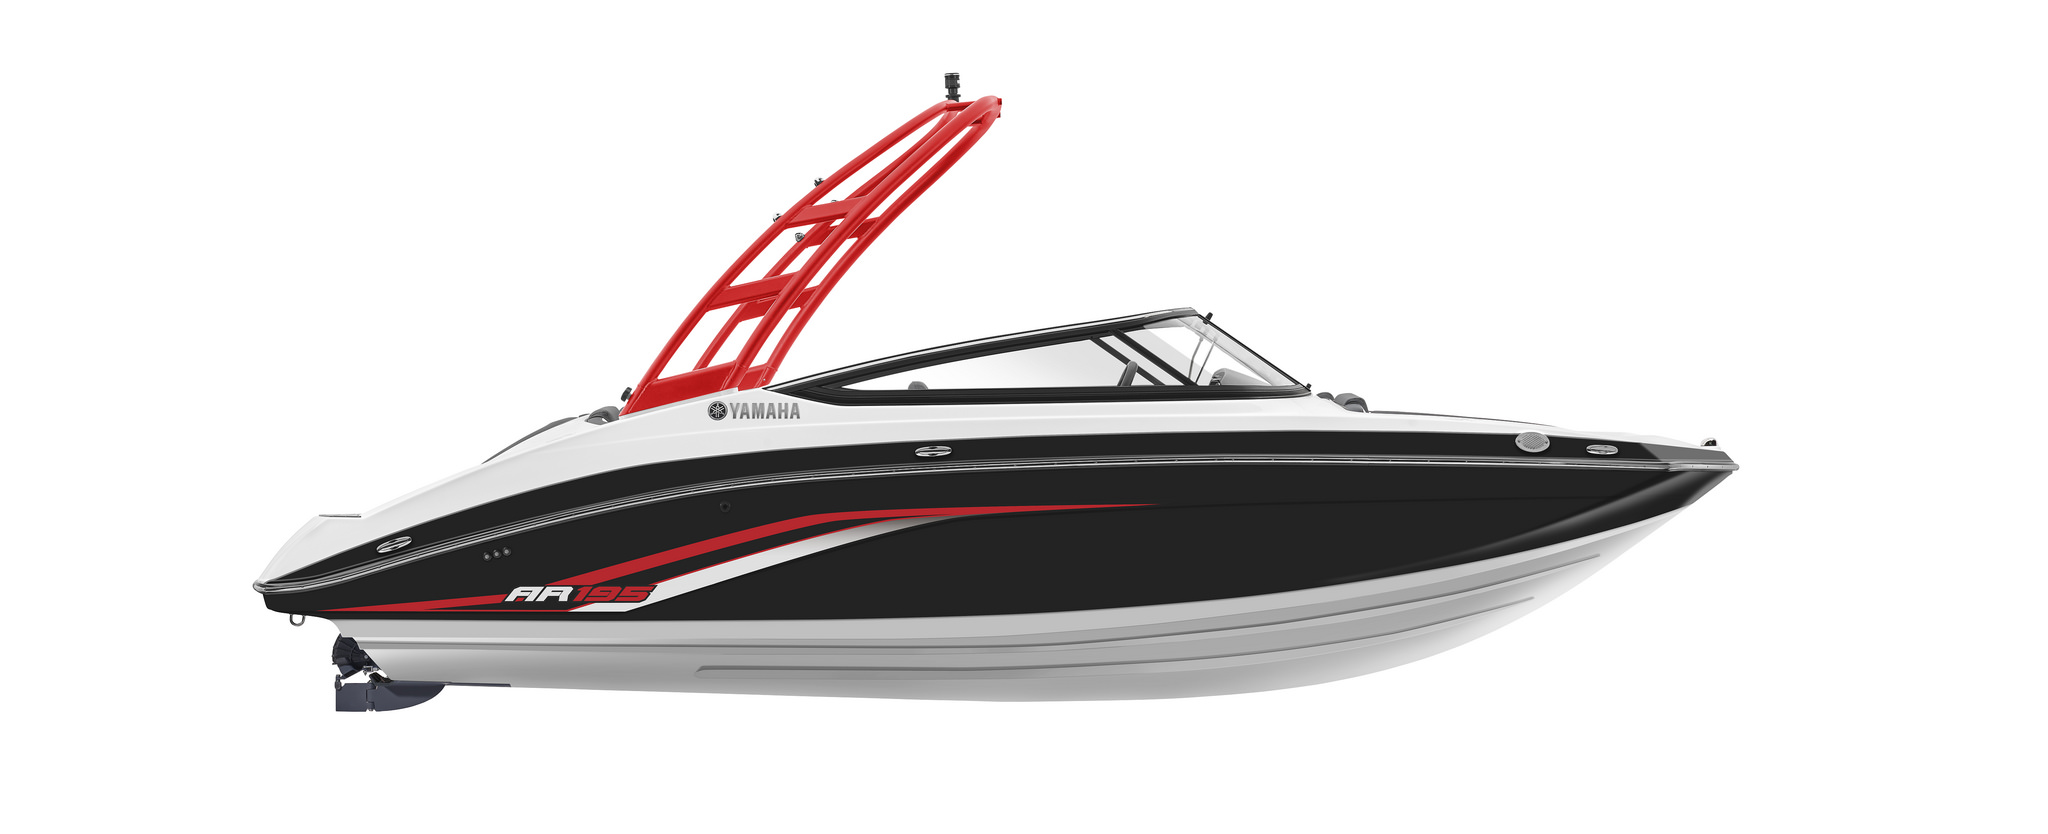 YamahaBoats AR195